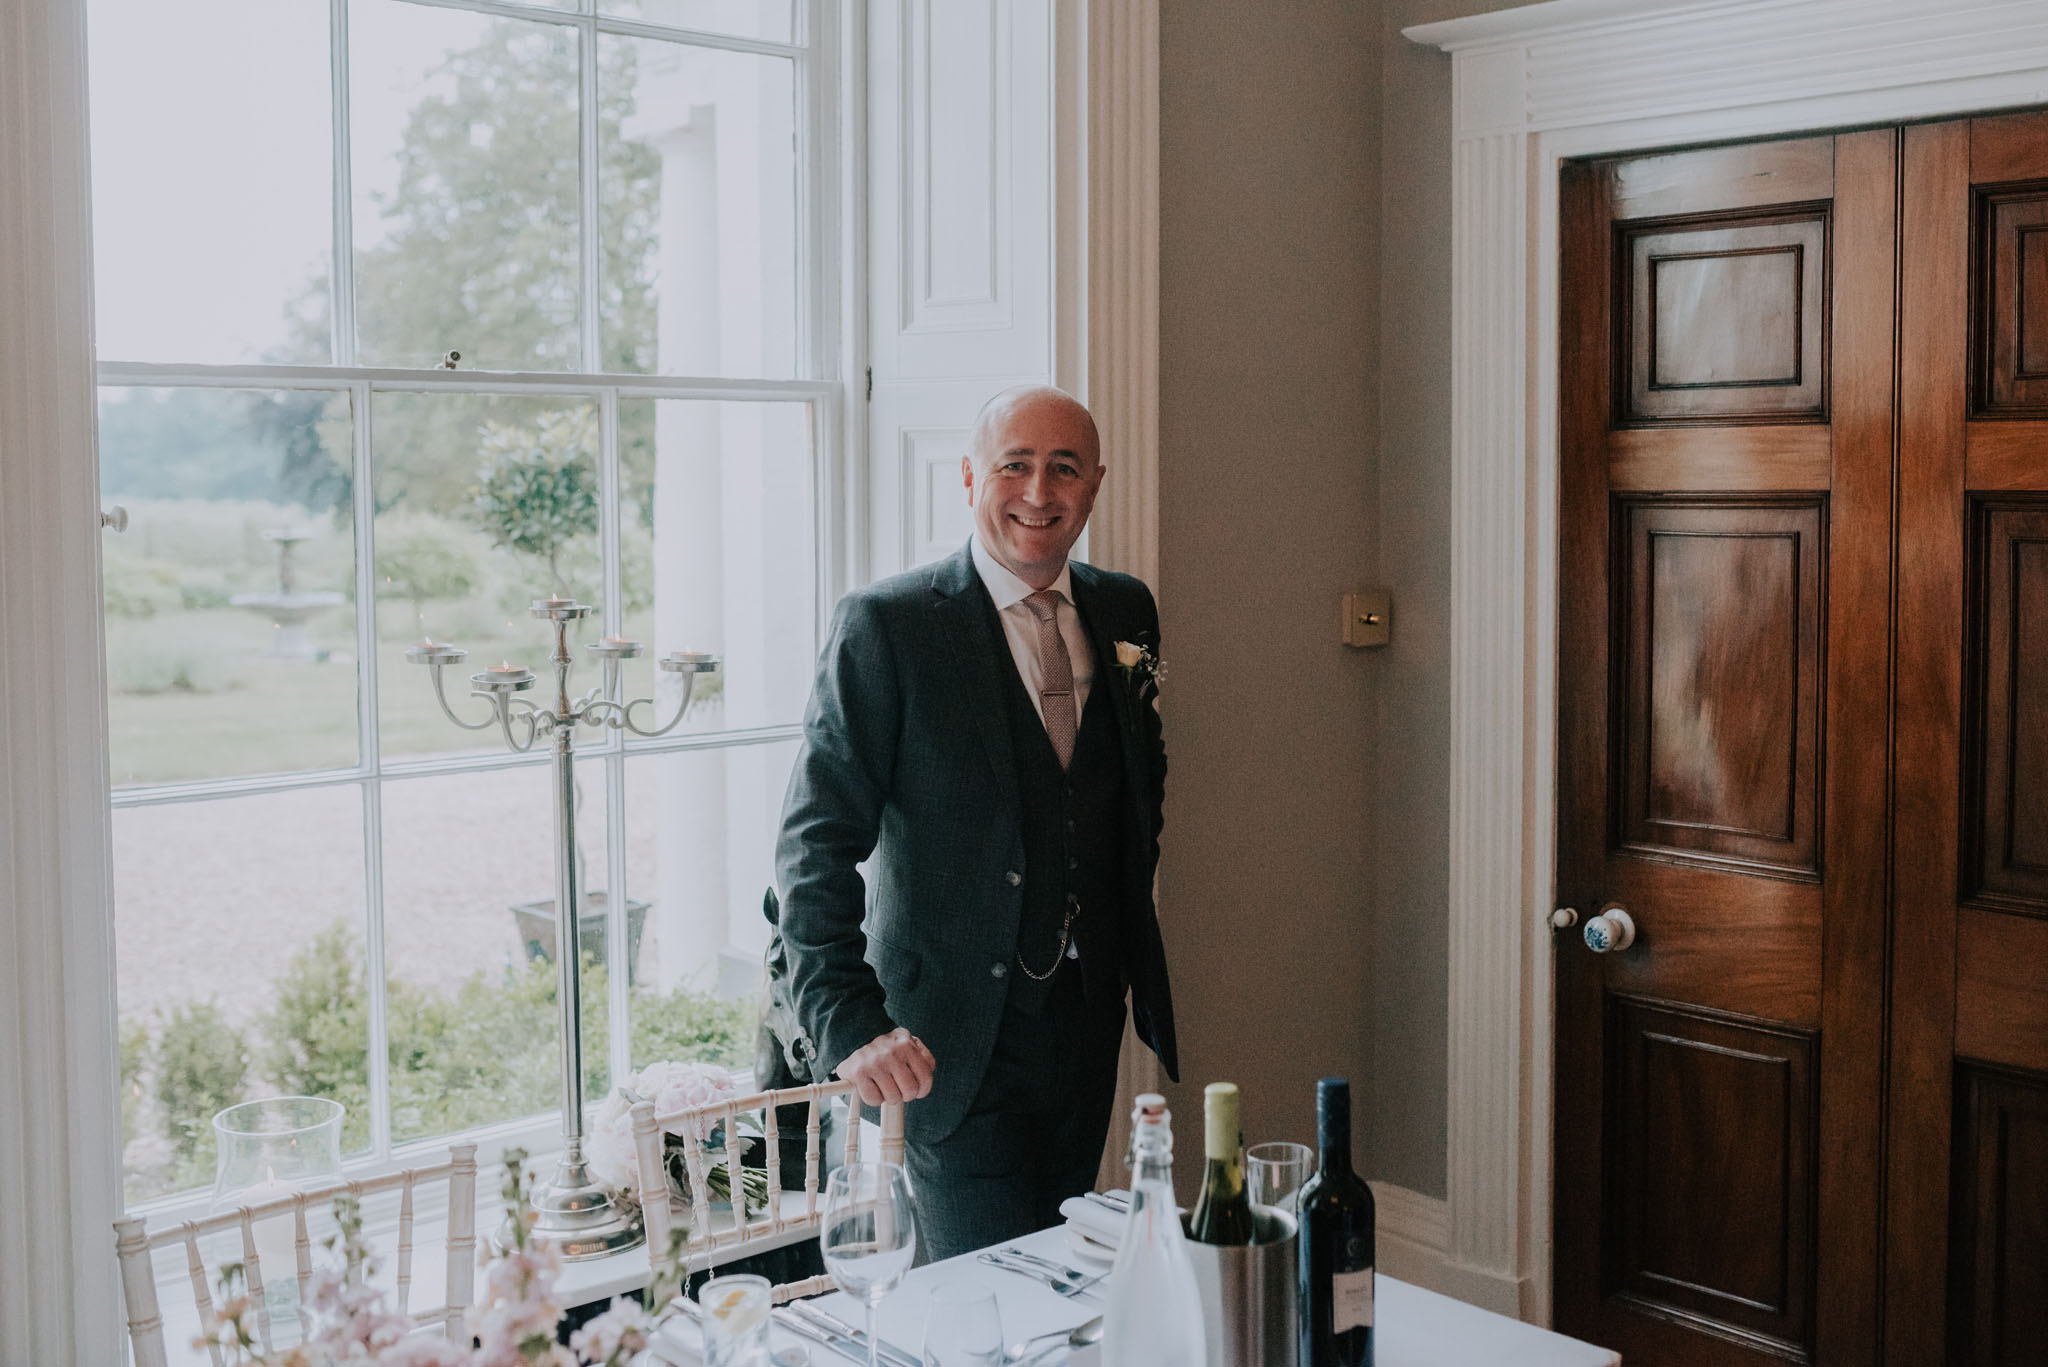 wedding-photographer-glewstone-court-hereford-scott-stockwell-photography376.jpg